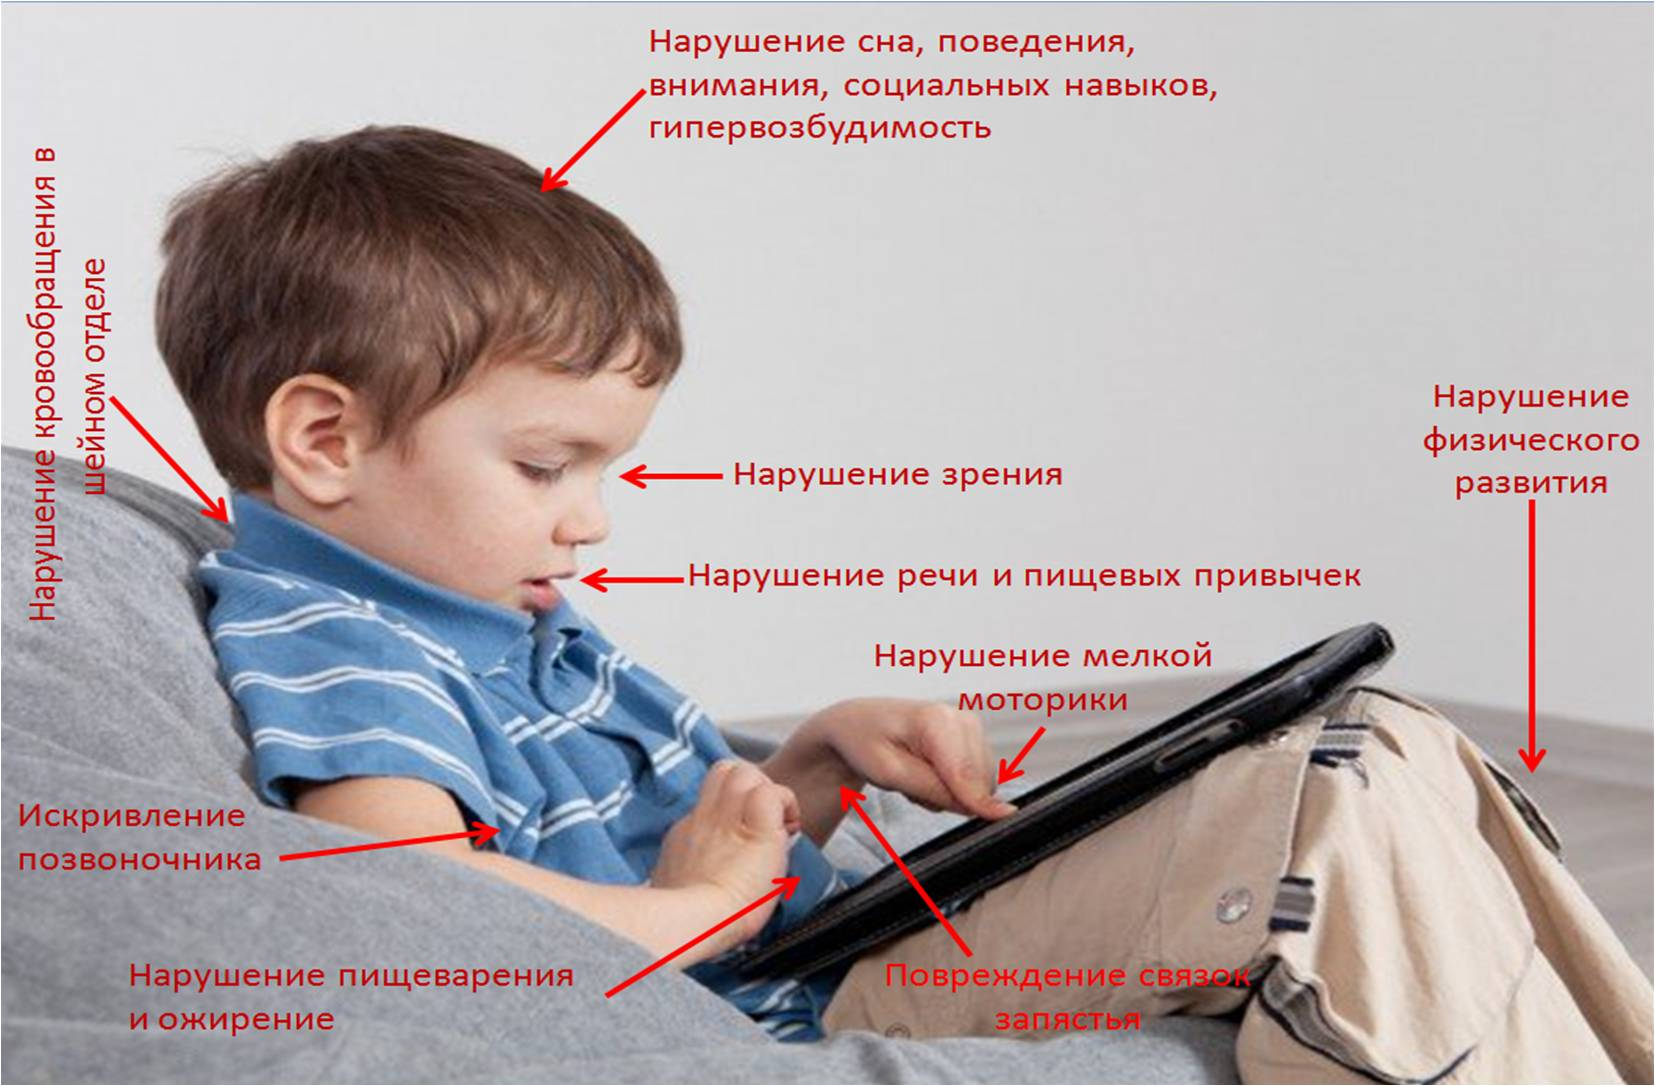 Вред планшета для ребенка